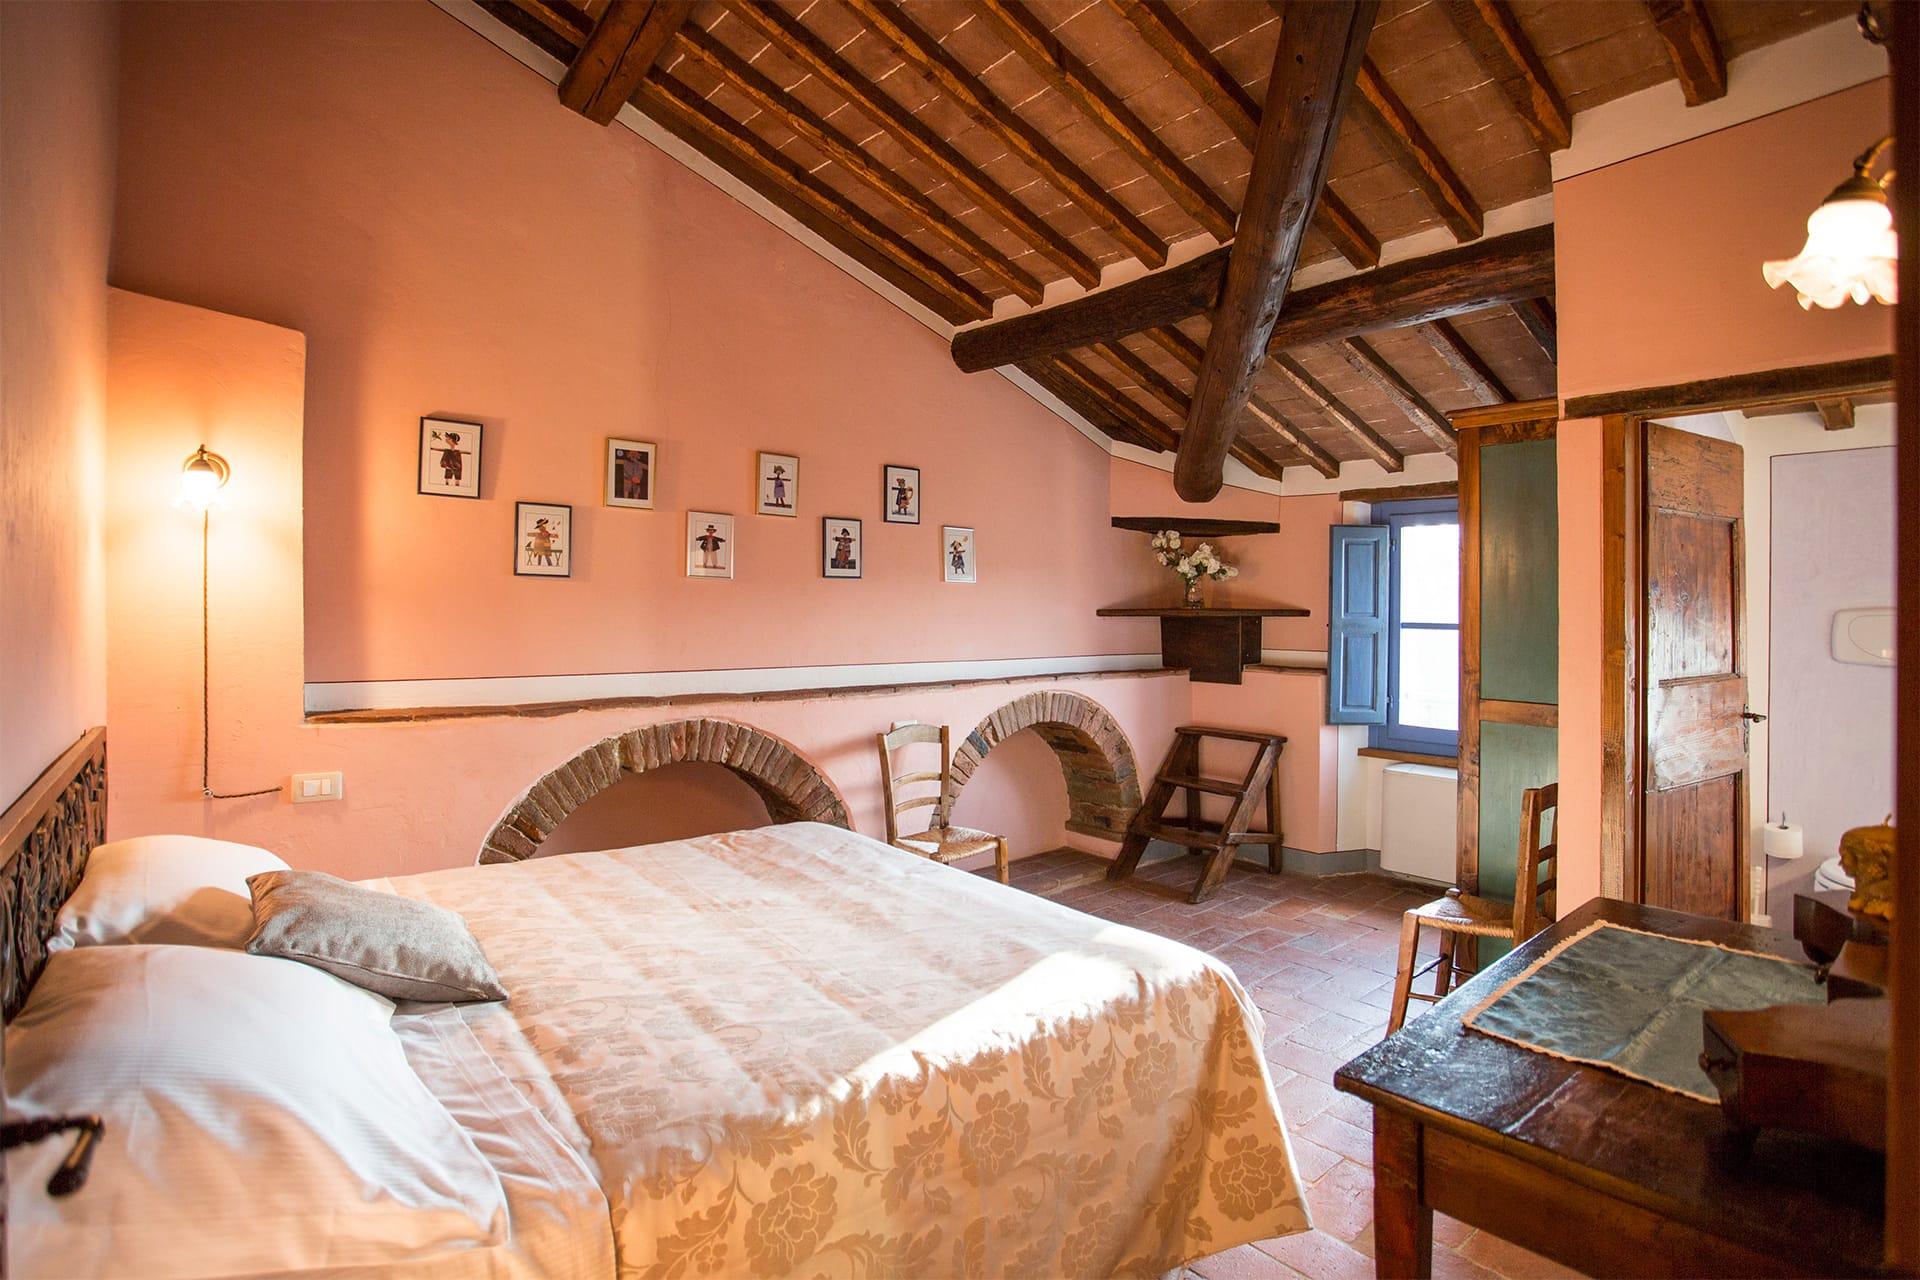 Casali in Val di Chio, Agriturismo in Toscana